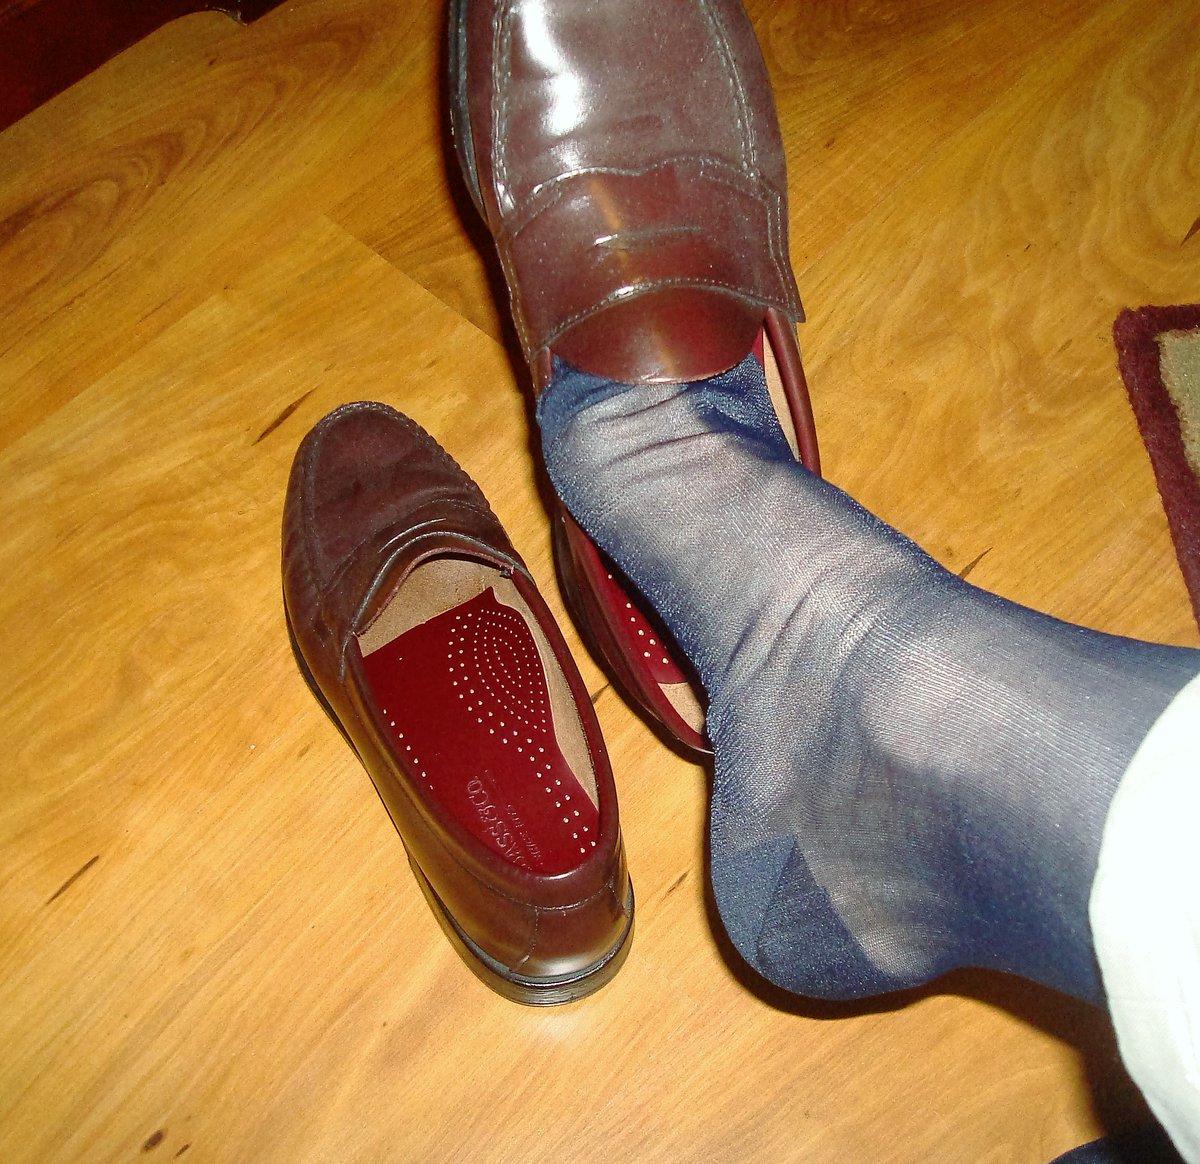 Sheer Socks And Weejunspic Twitter Com Dxzqictceu